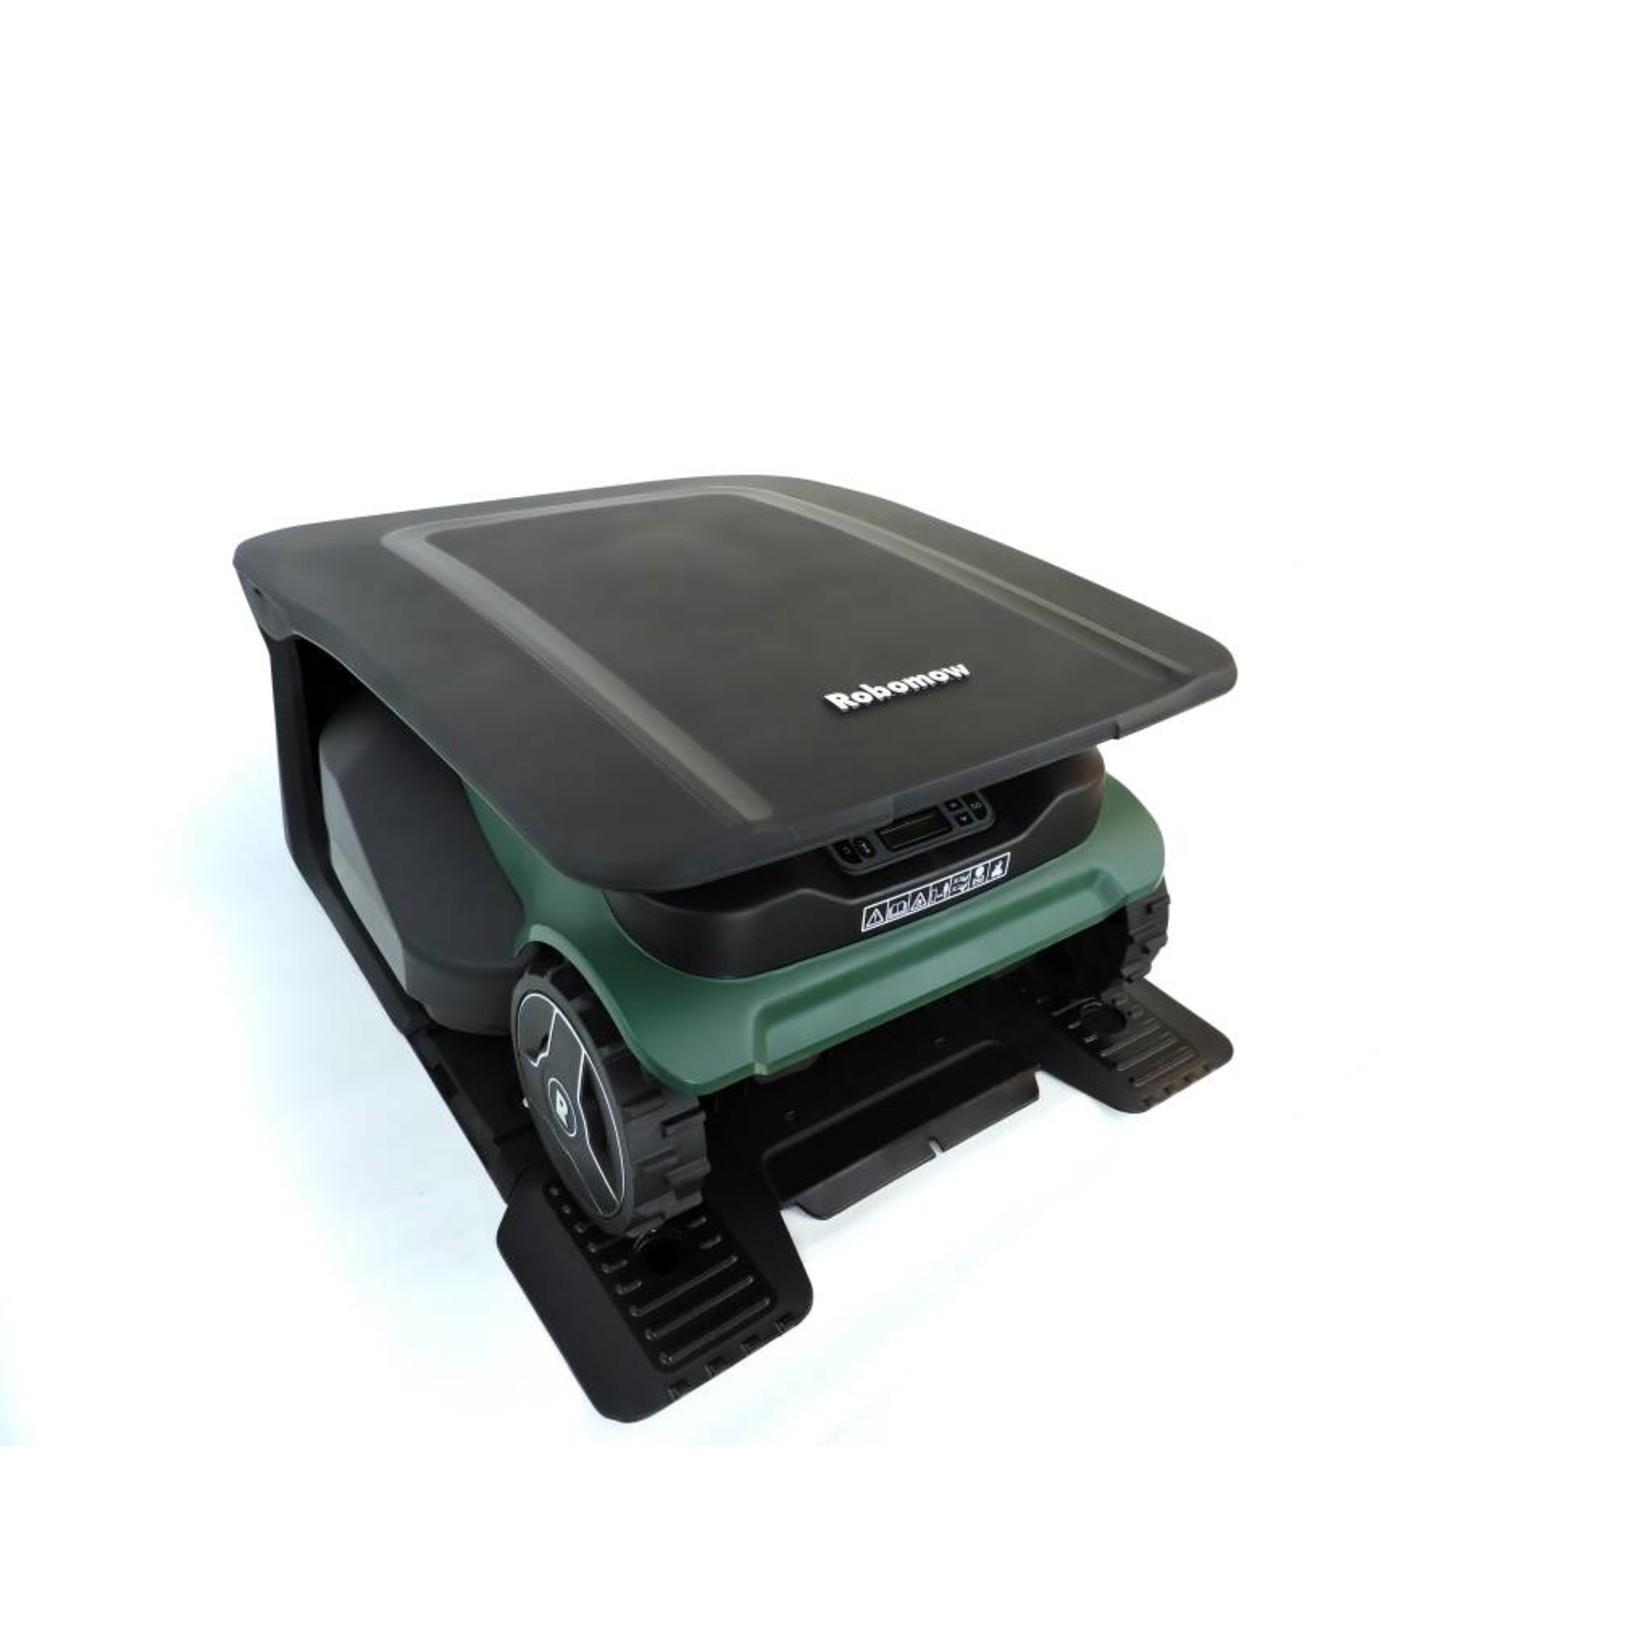 Robomow Robomow RoboHome Garage für RS/MS/TS - Modelle MRK0076A